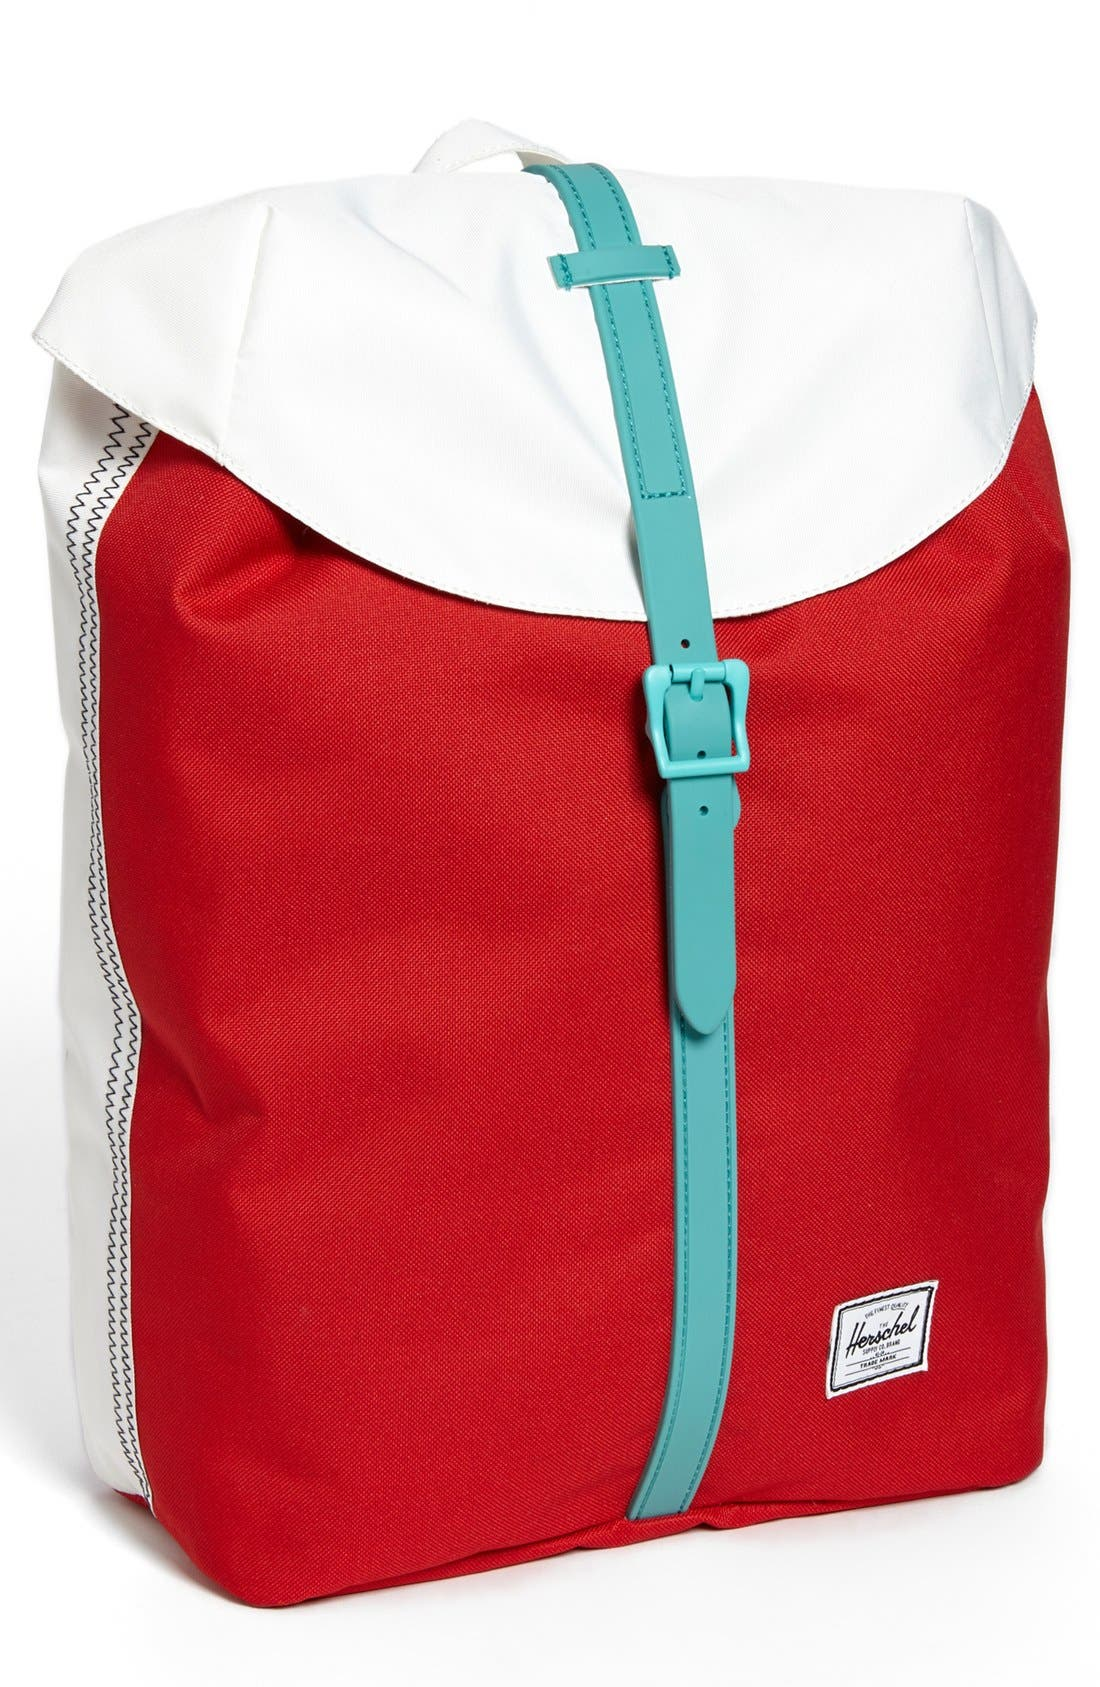 Alternate Image 1 Selected - Herschel Supply Co. 'Post - Studio Collection' Backpack